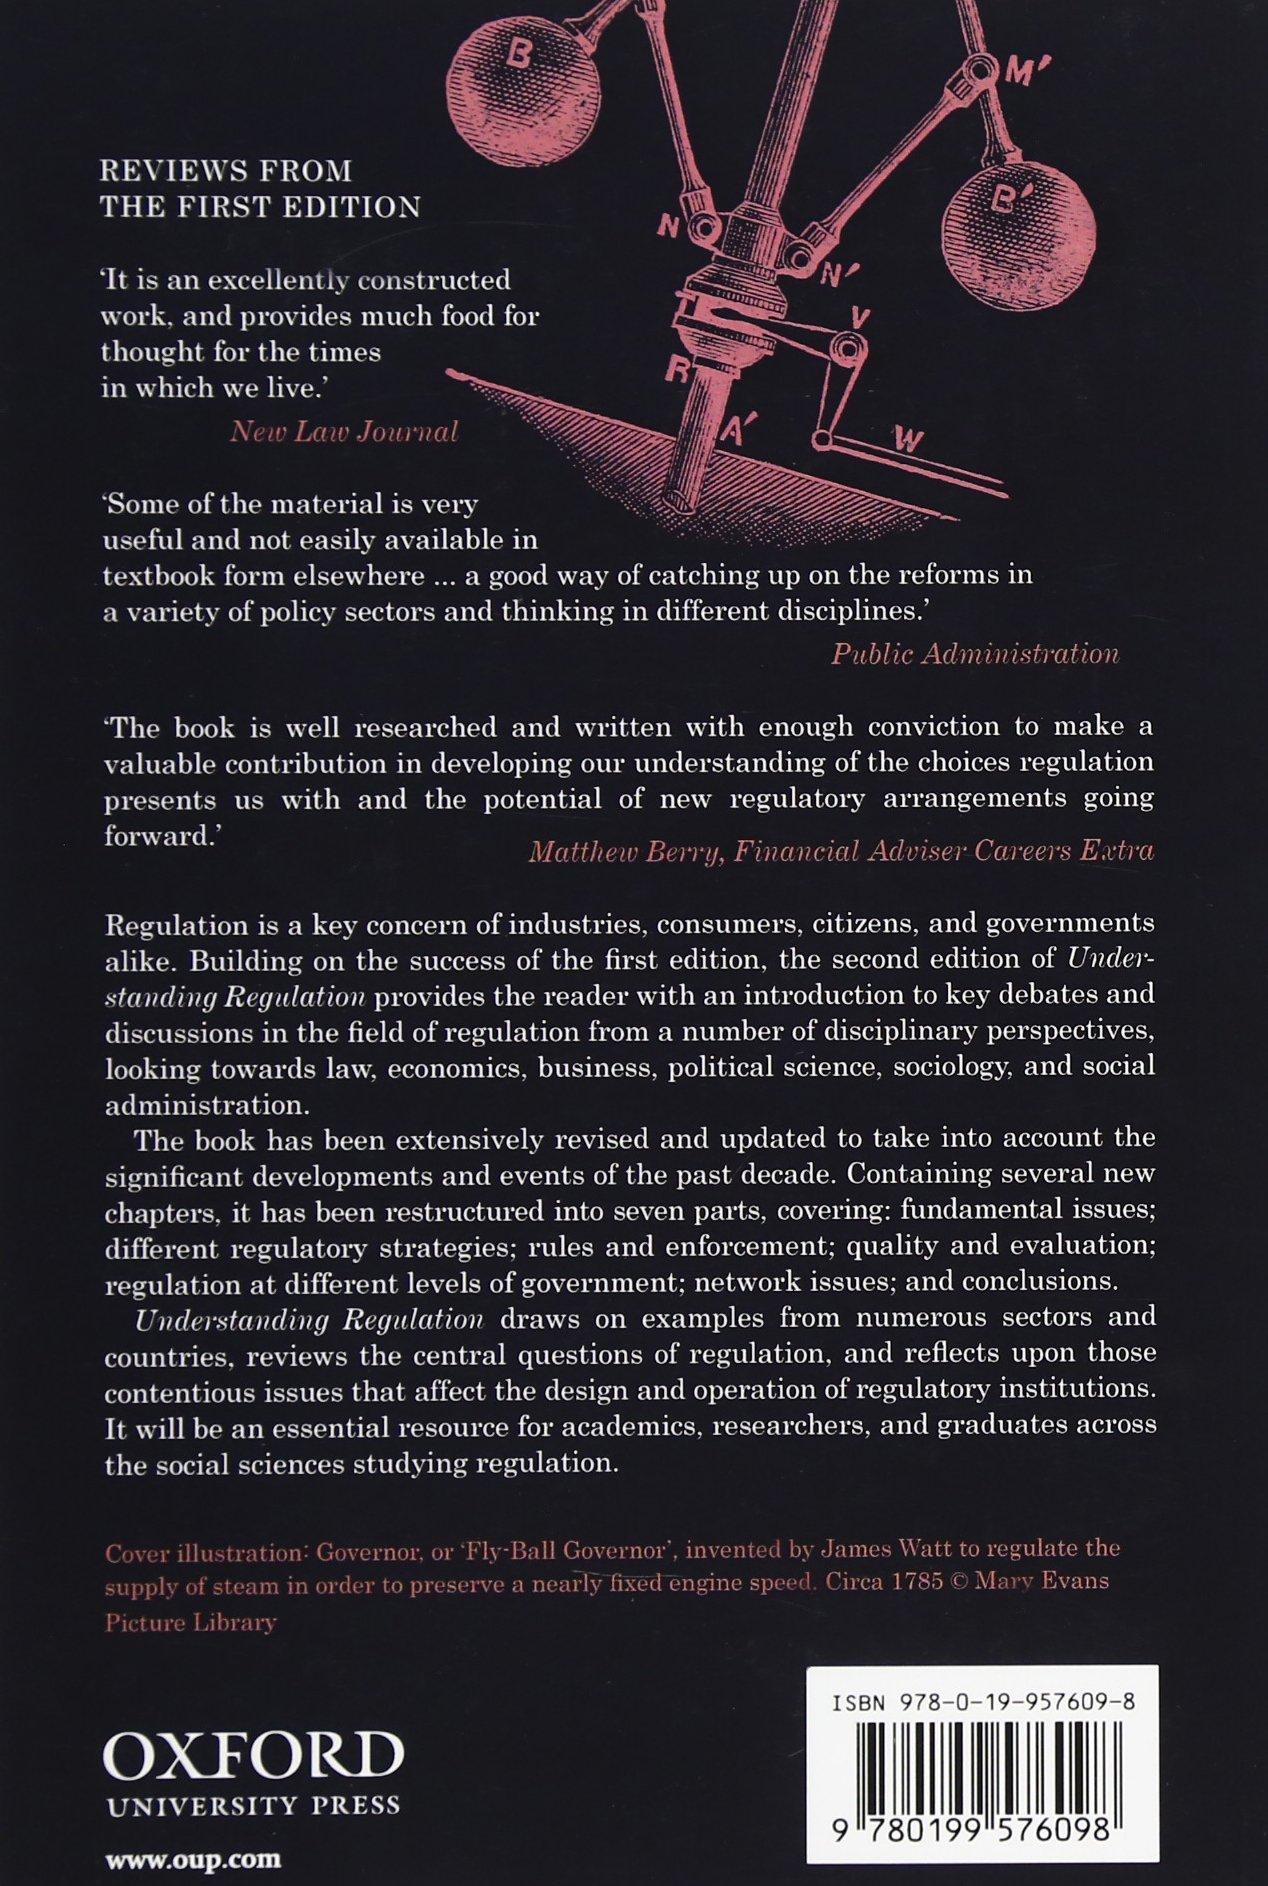 Understanding Regulation: Theory, Strategy, and Practice: Amazon.de: Robert  Baldwin, Martin Cave, Martin Lodge: Fremdsprachige Bücher